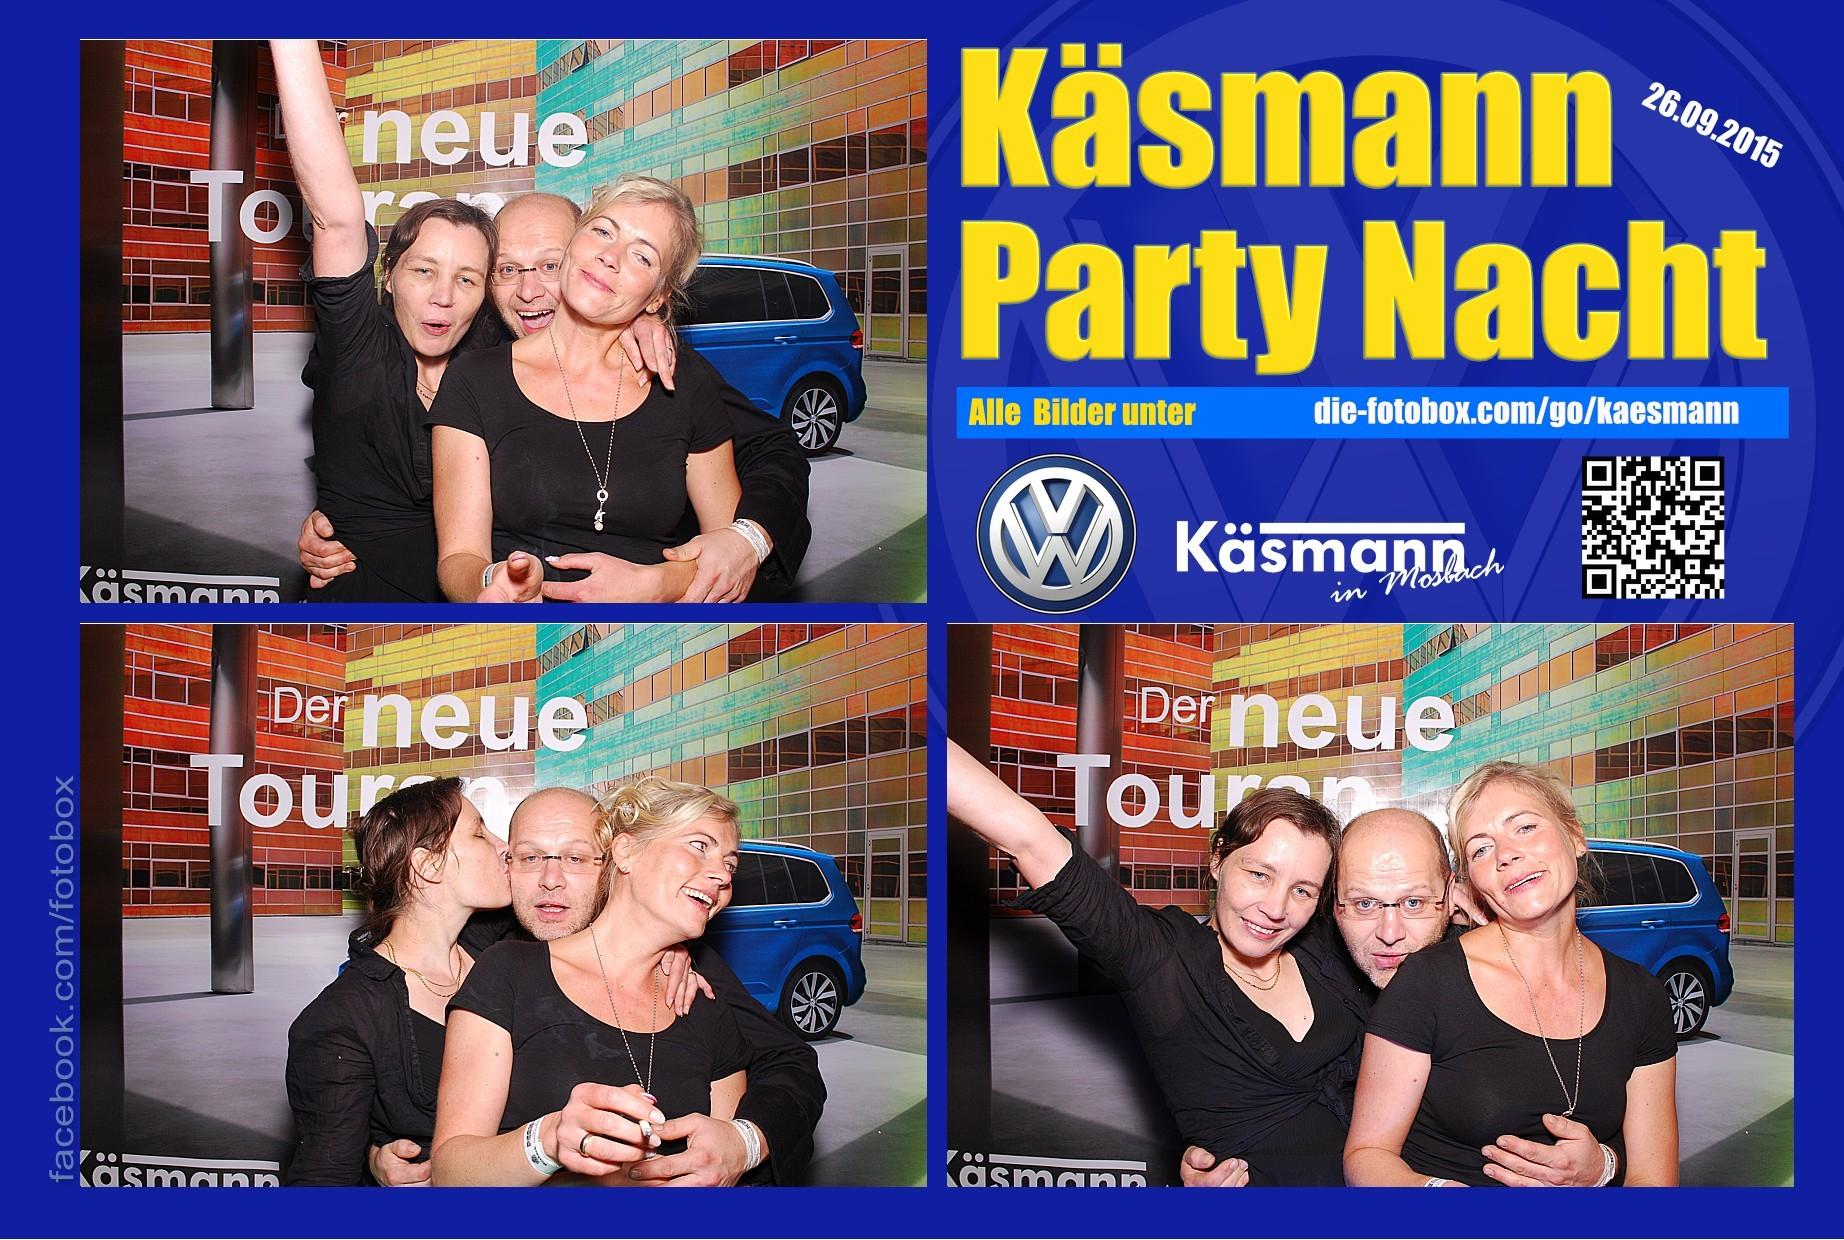 Käsmannparty 2015 - www.die-fotobox.com 01360